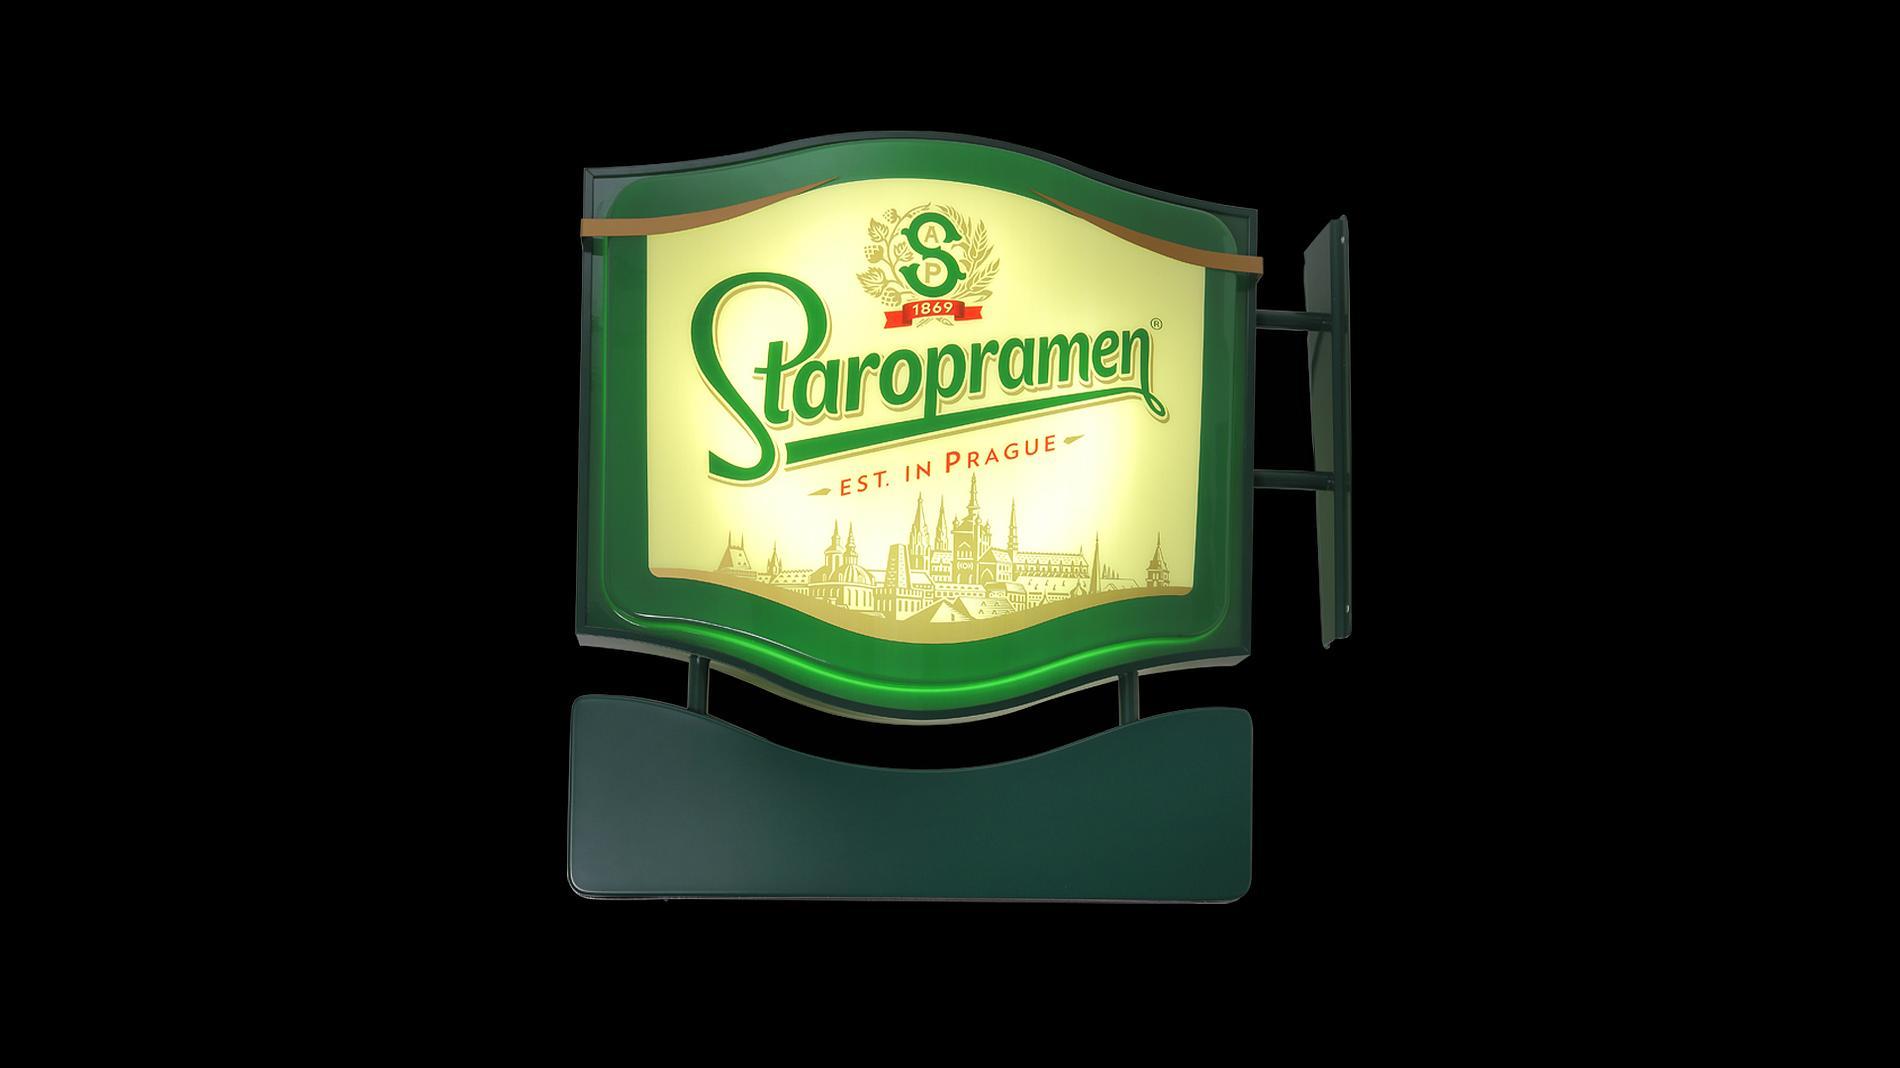 exterior lightbox Staropramen, POS materials